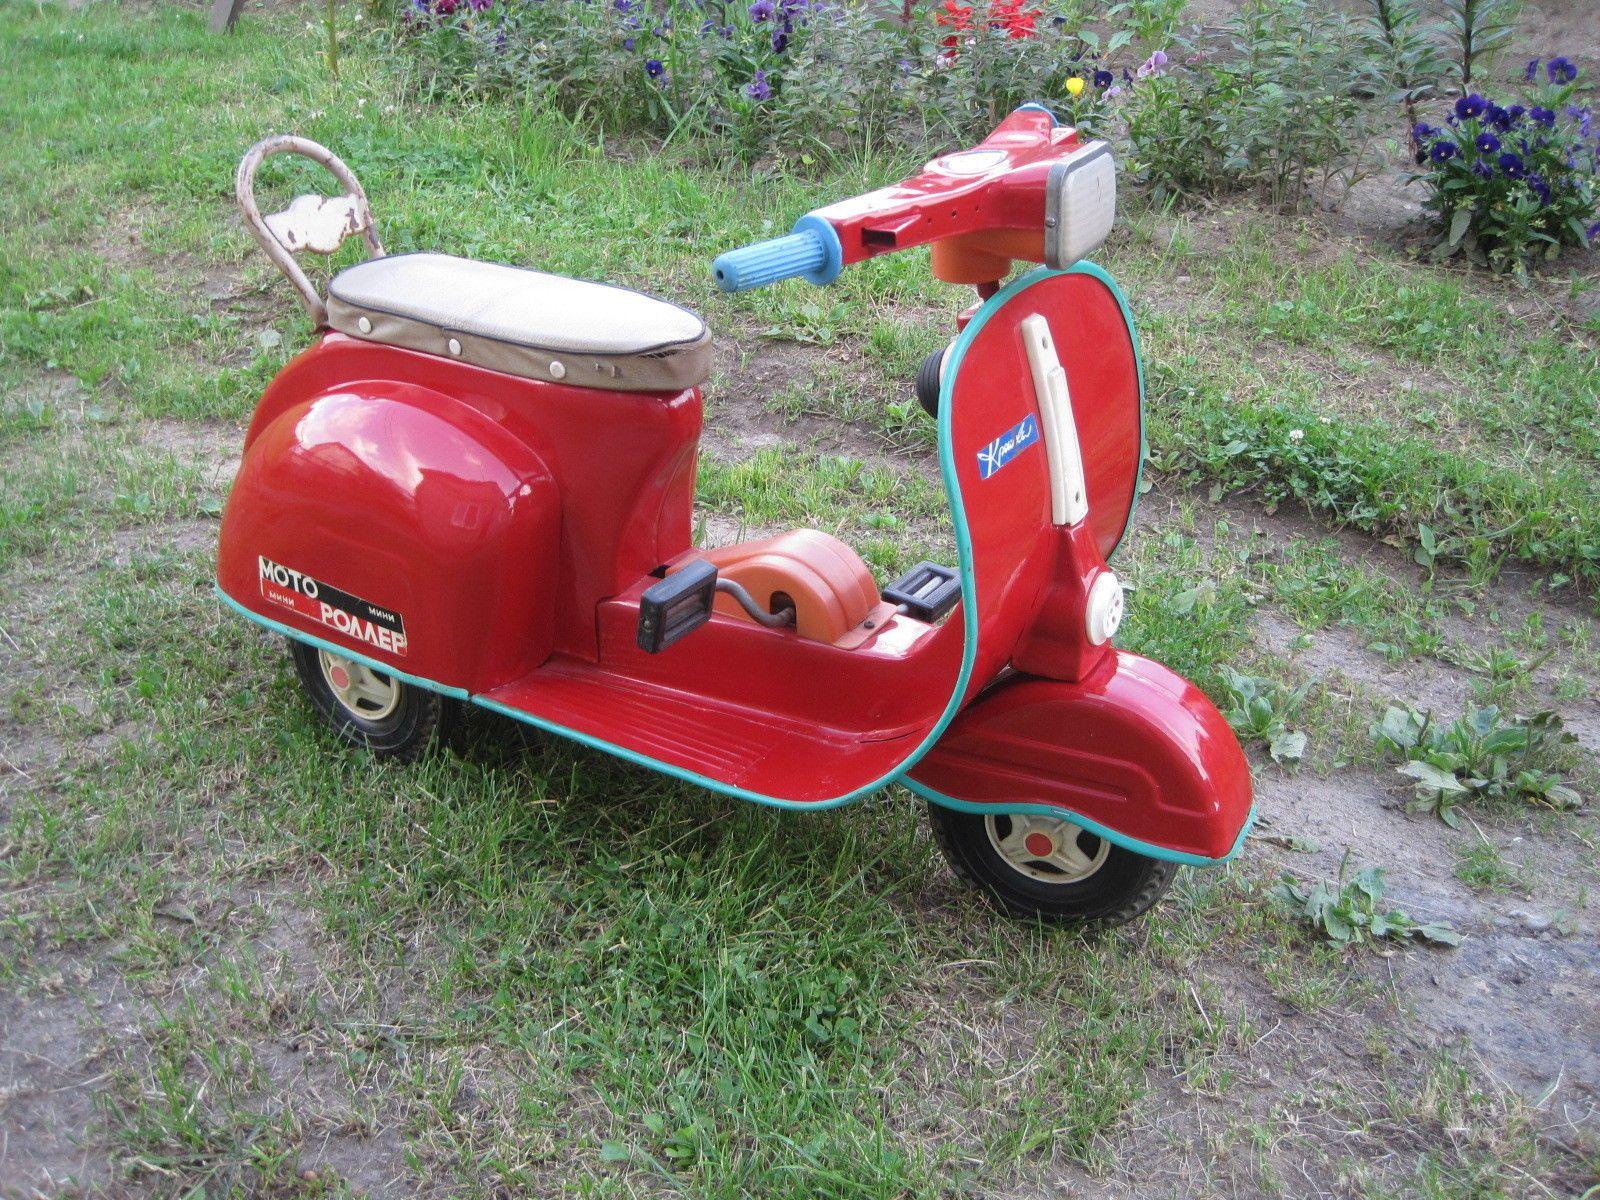 Scooter pedal the USSR car original , Russian Vespa Soviet